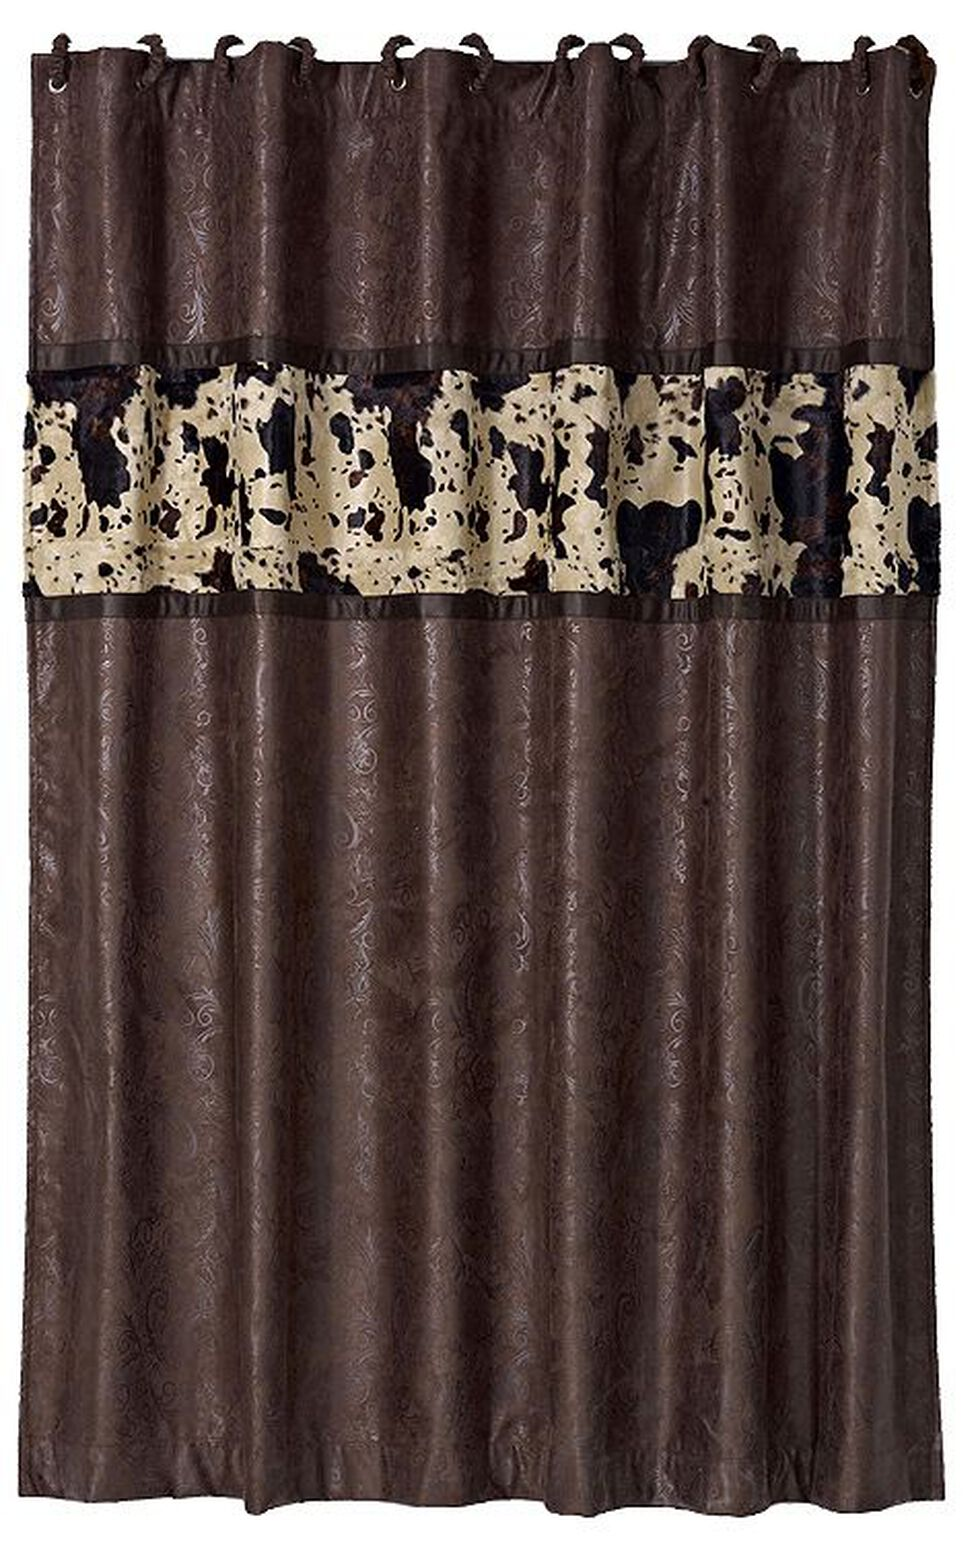 HiEnd Accents Caldwell Cowhide Shower Curtain, Multi, hi-res